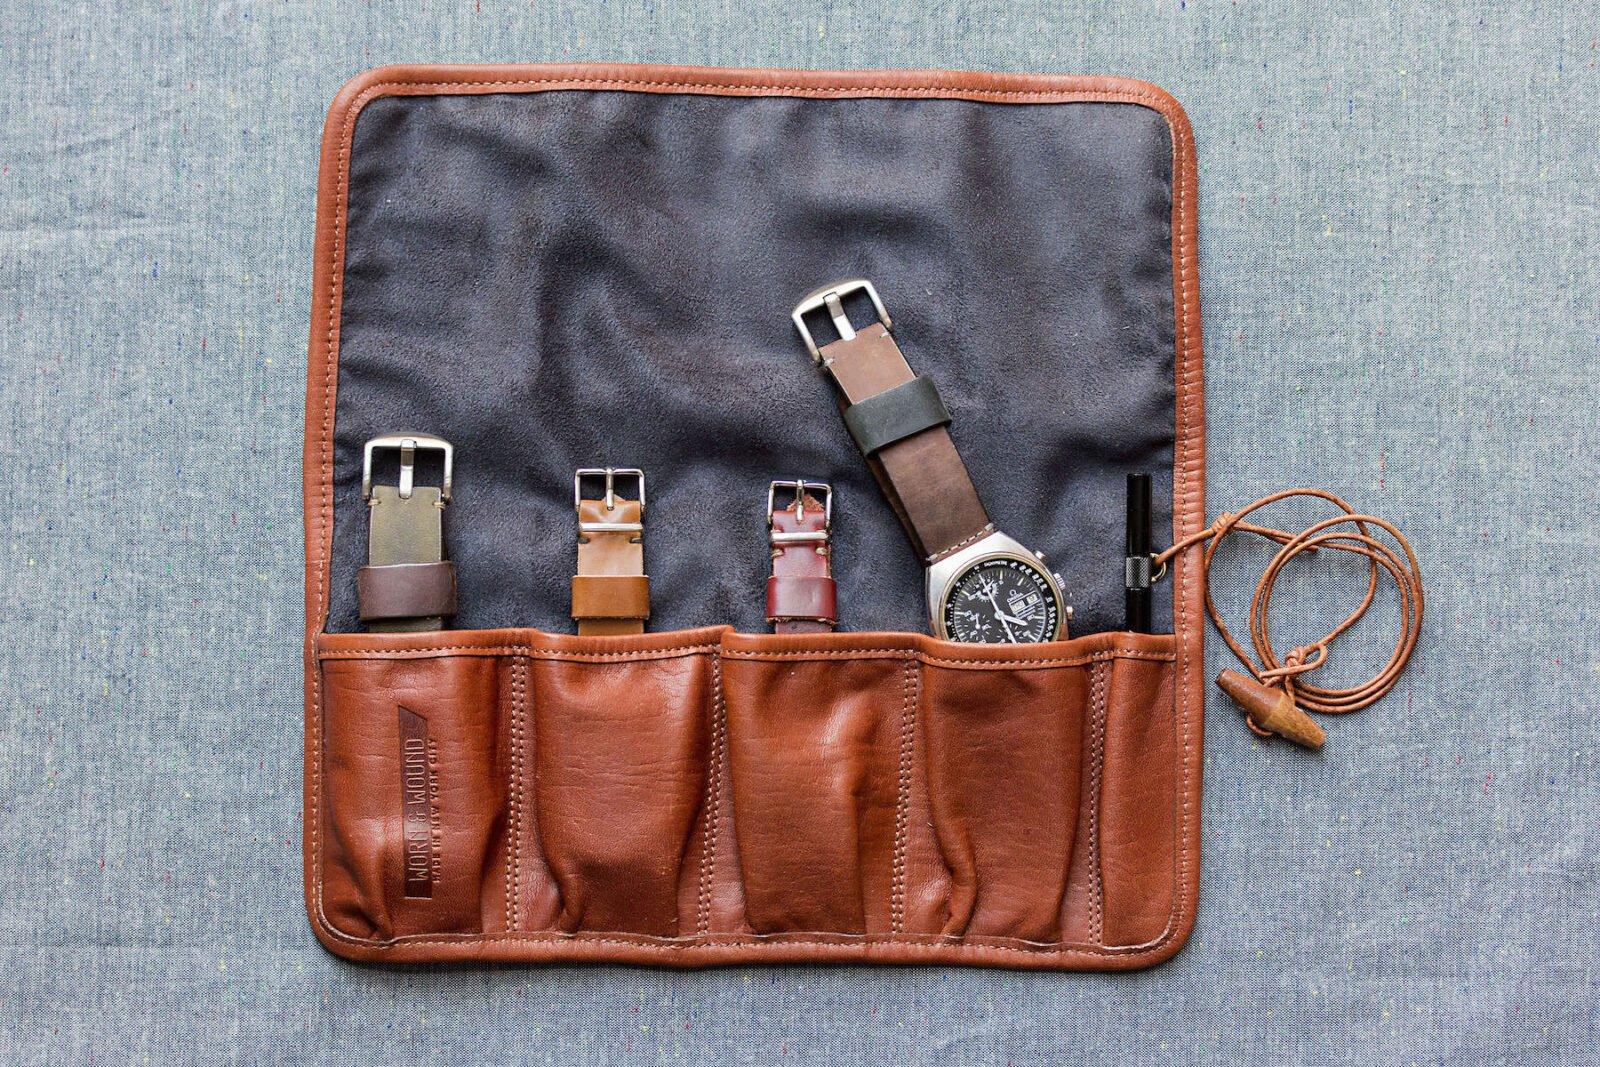 Watch Roll 1600x1067 - Harris Tweed Watch Roll by Worn & Wound